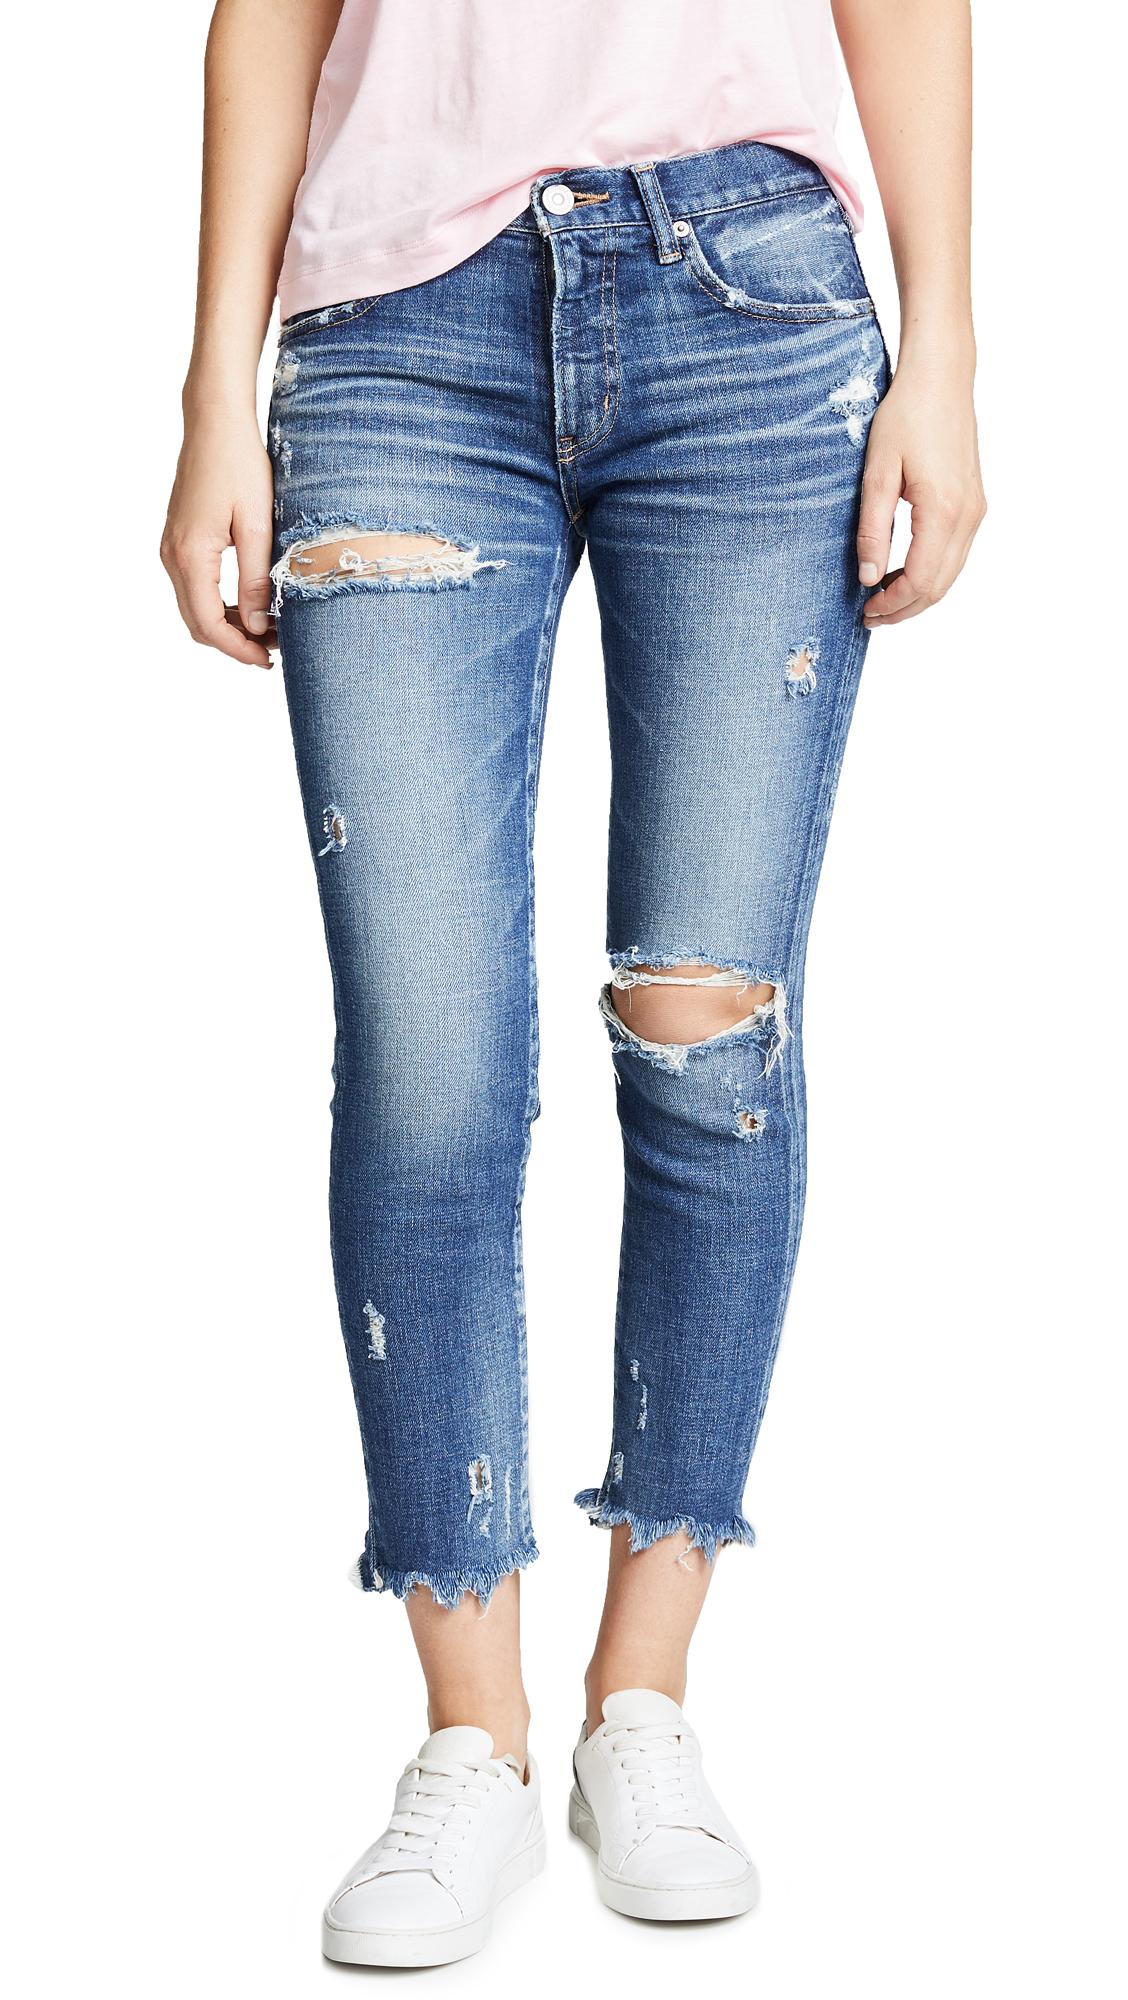 MOUSSY VINTAGE Ridgewood Comfort Skinny Jeans In Blue